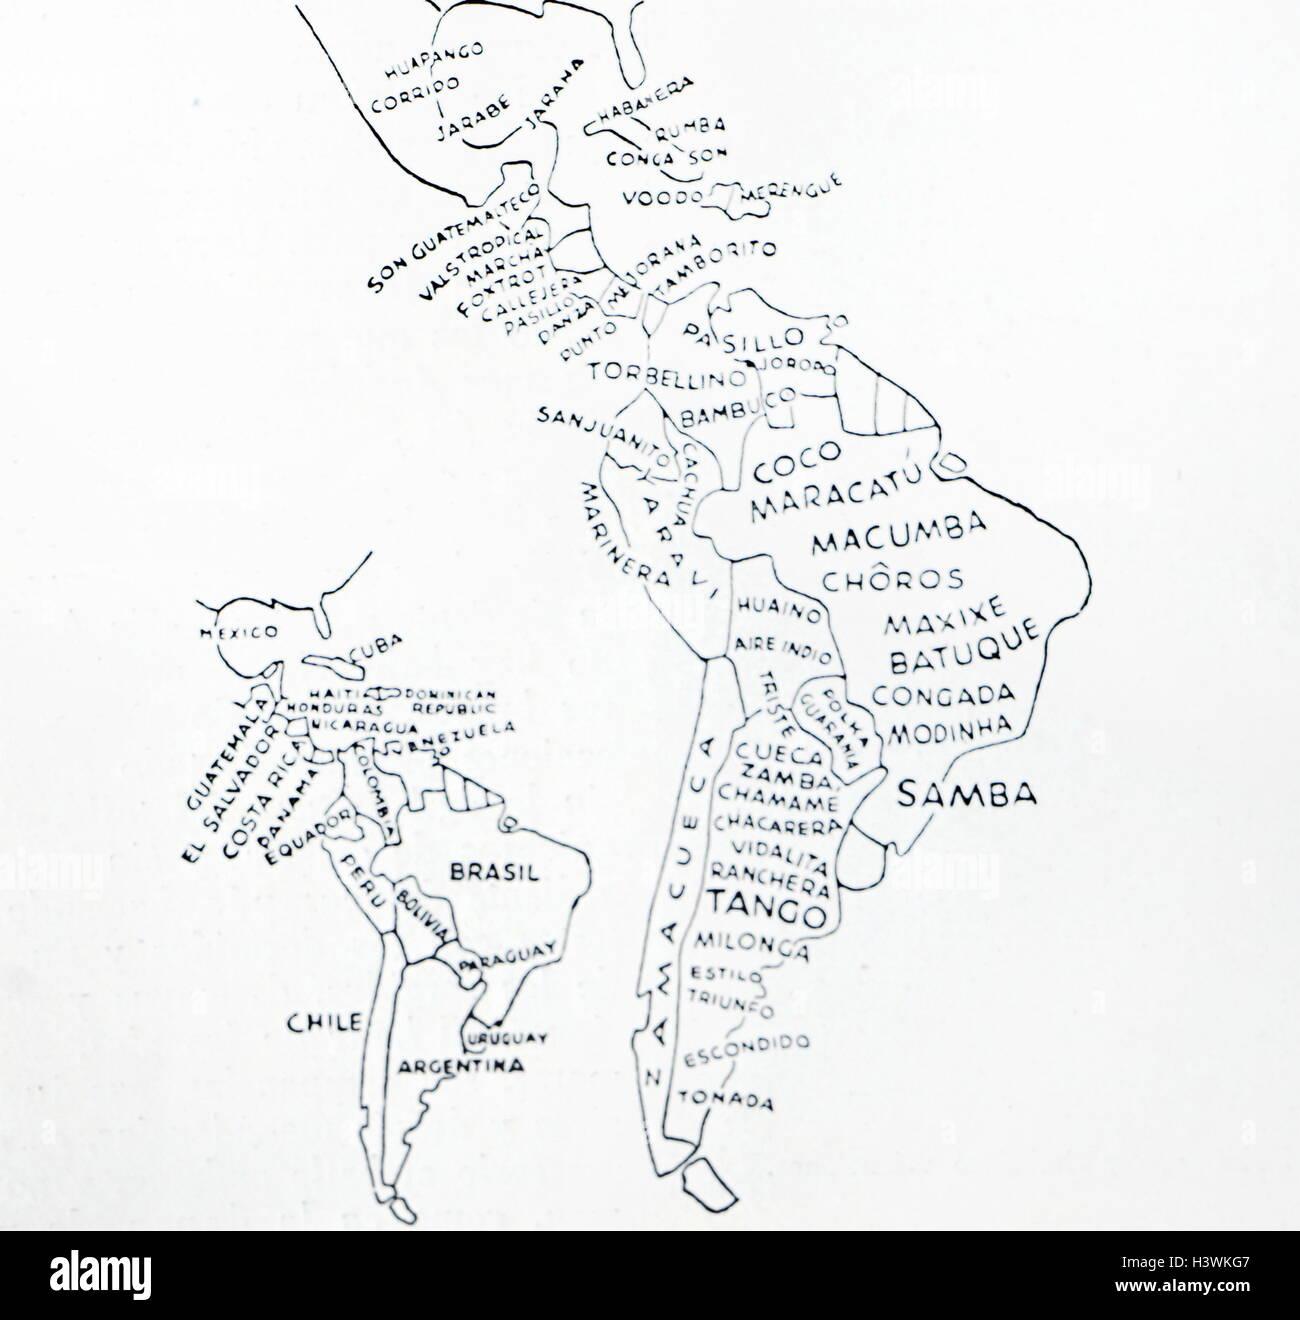 South America Countries Map Stockfotos & South America ...